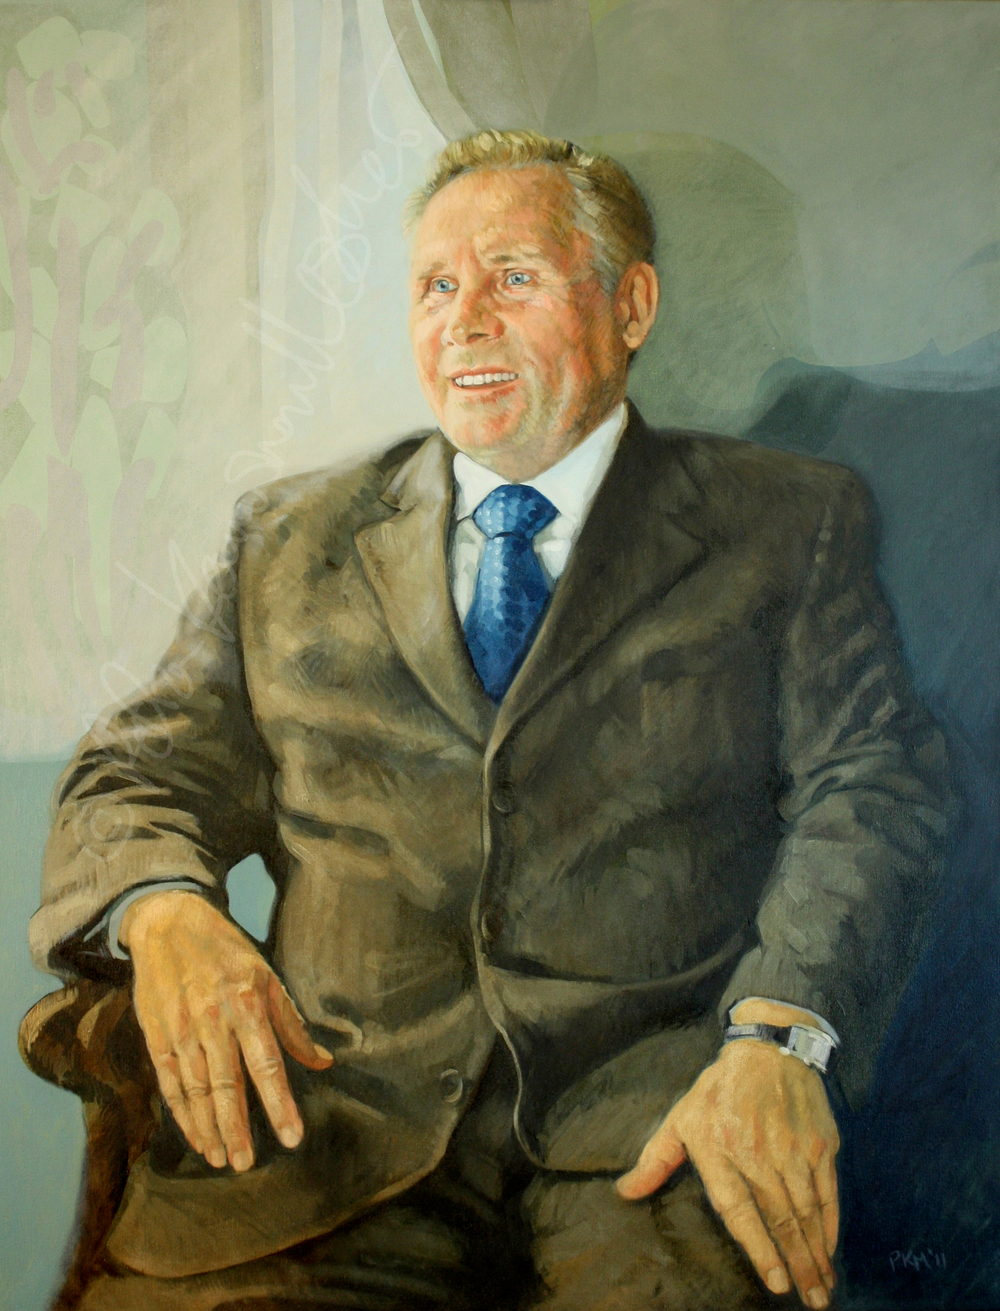 Emeritus Professor Mikko Ojala